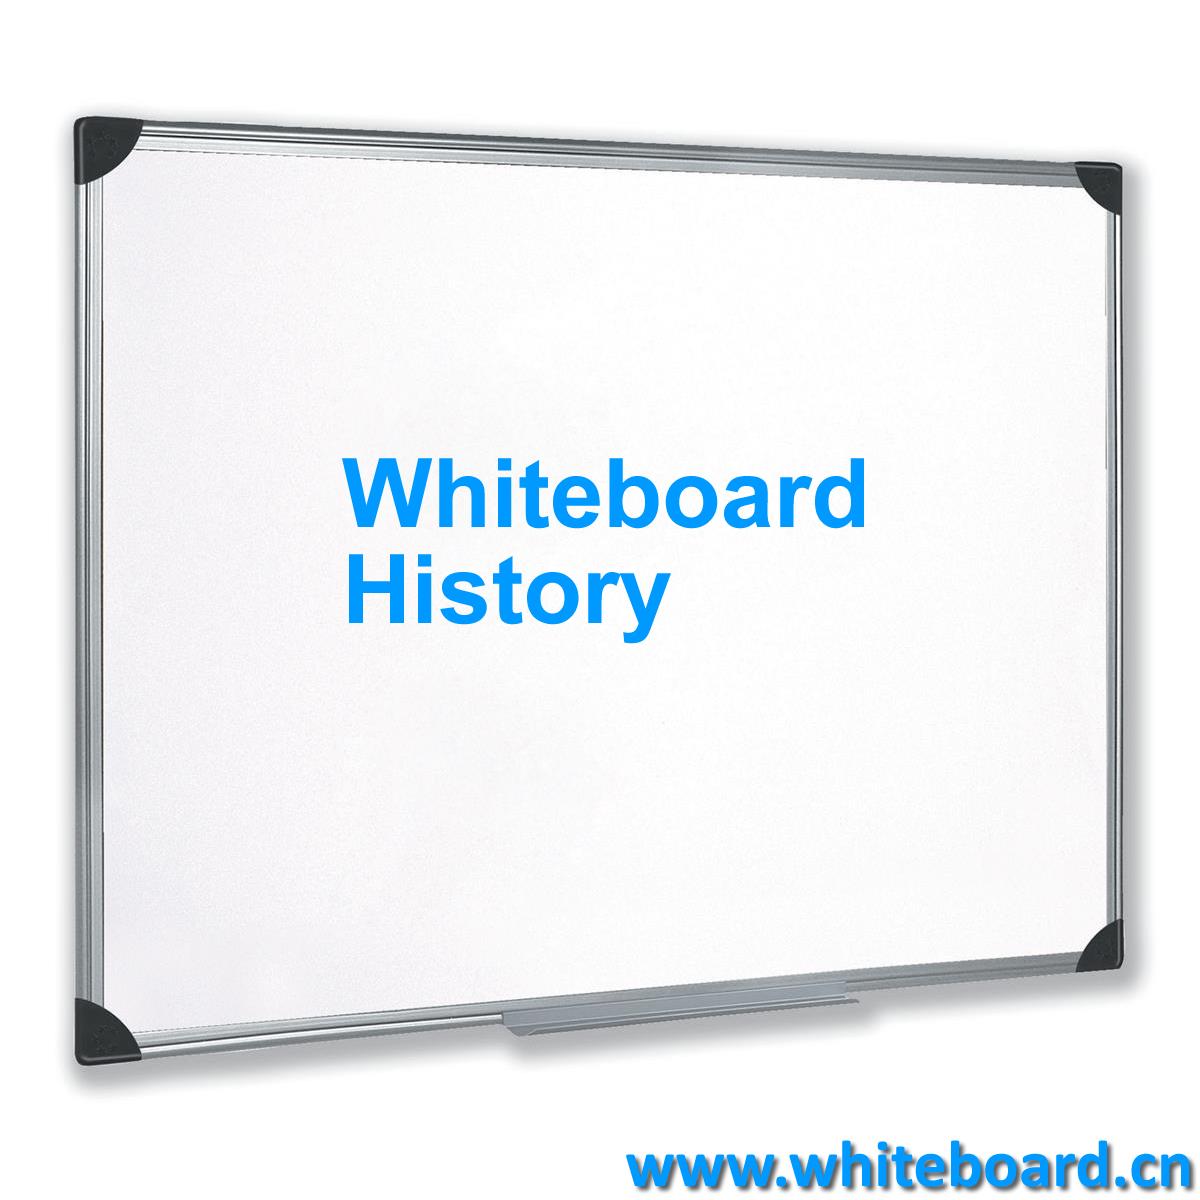 Whiteboard History